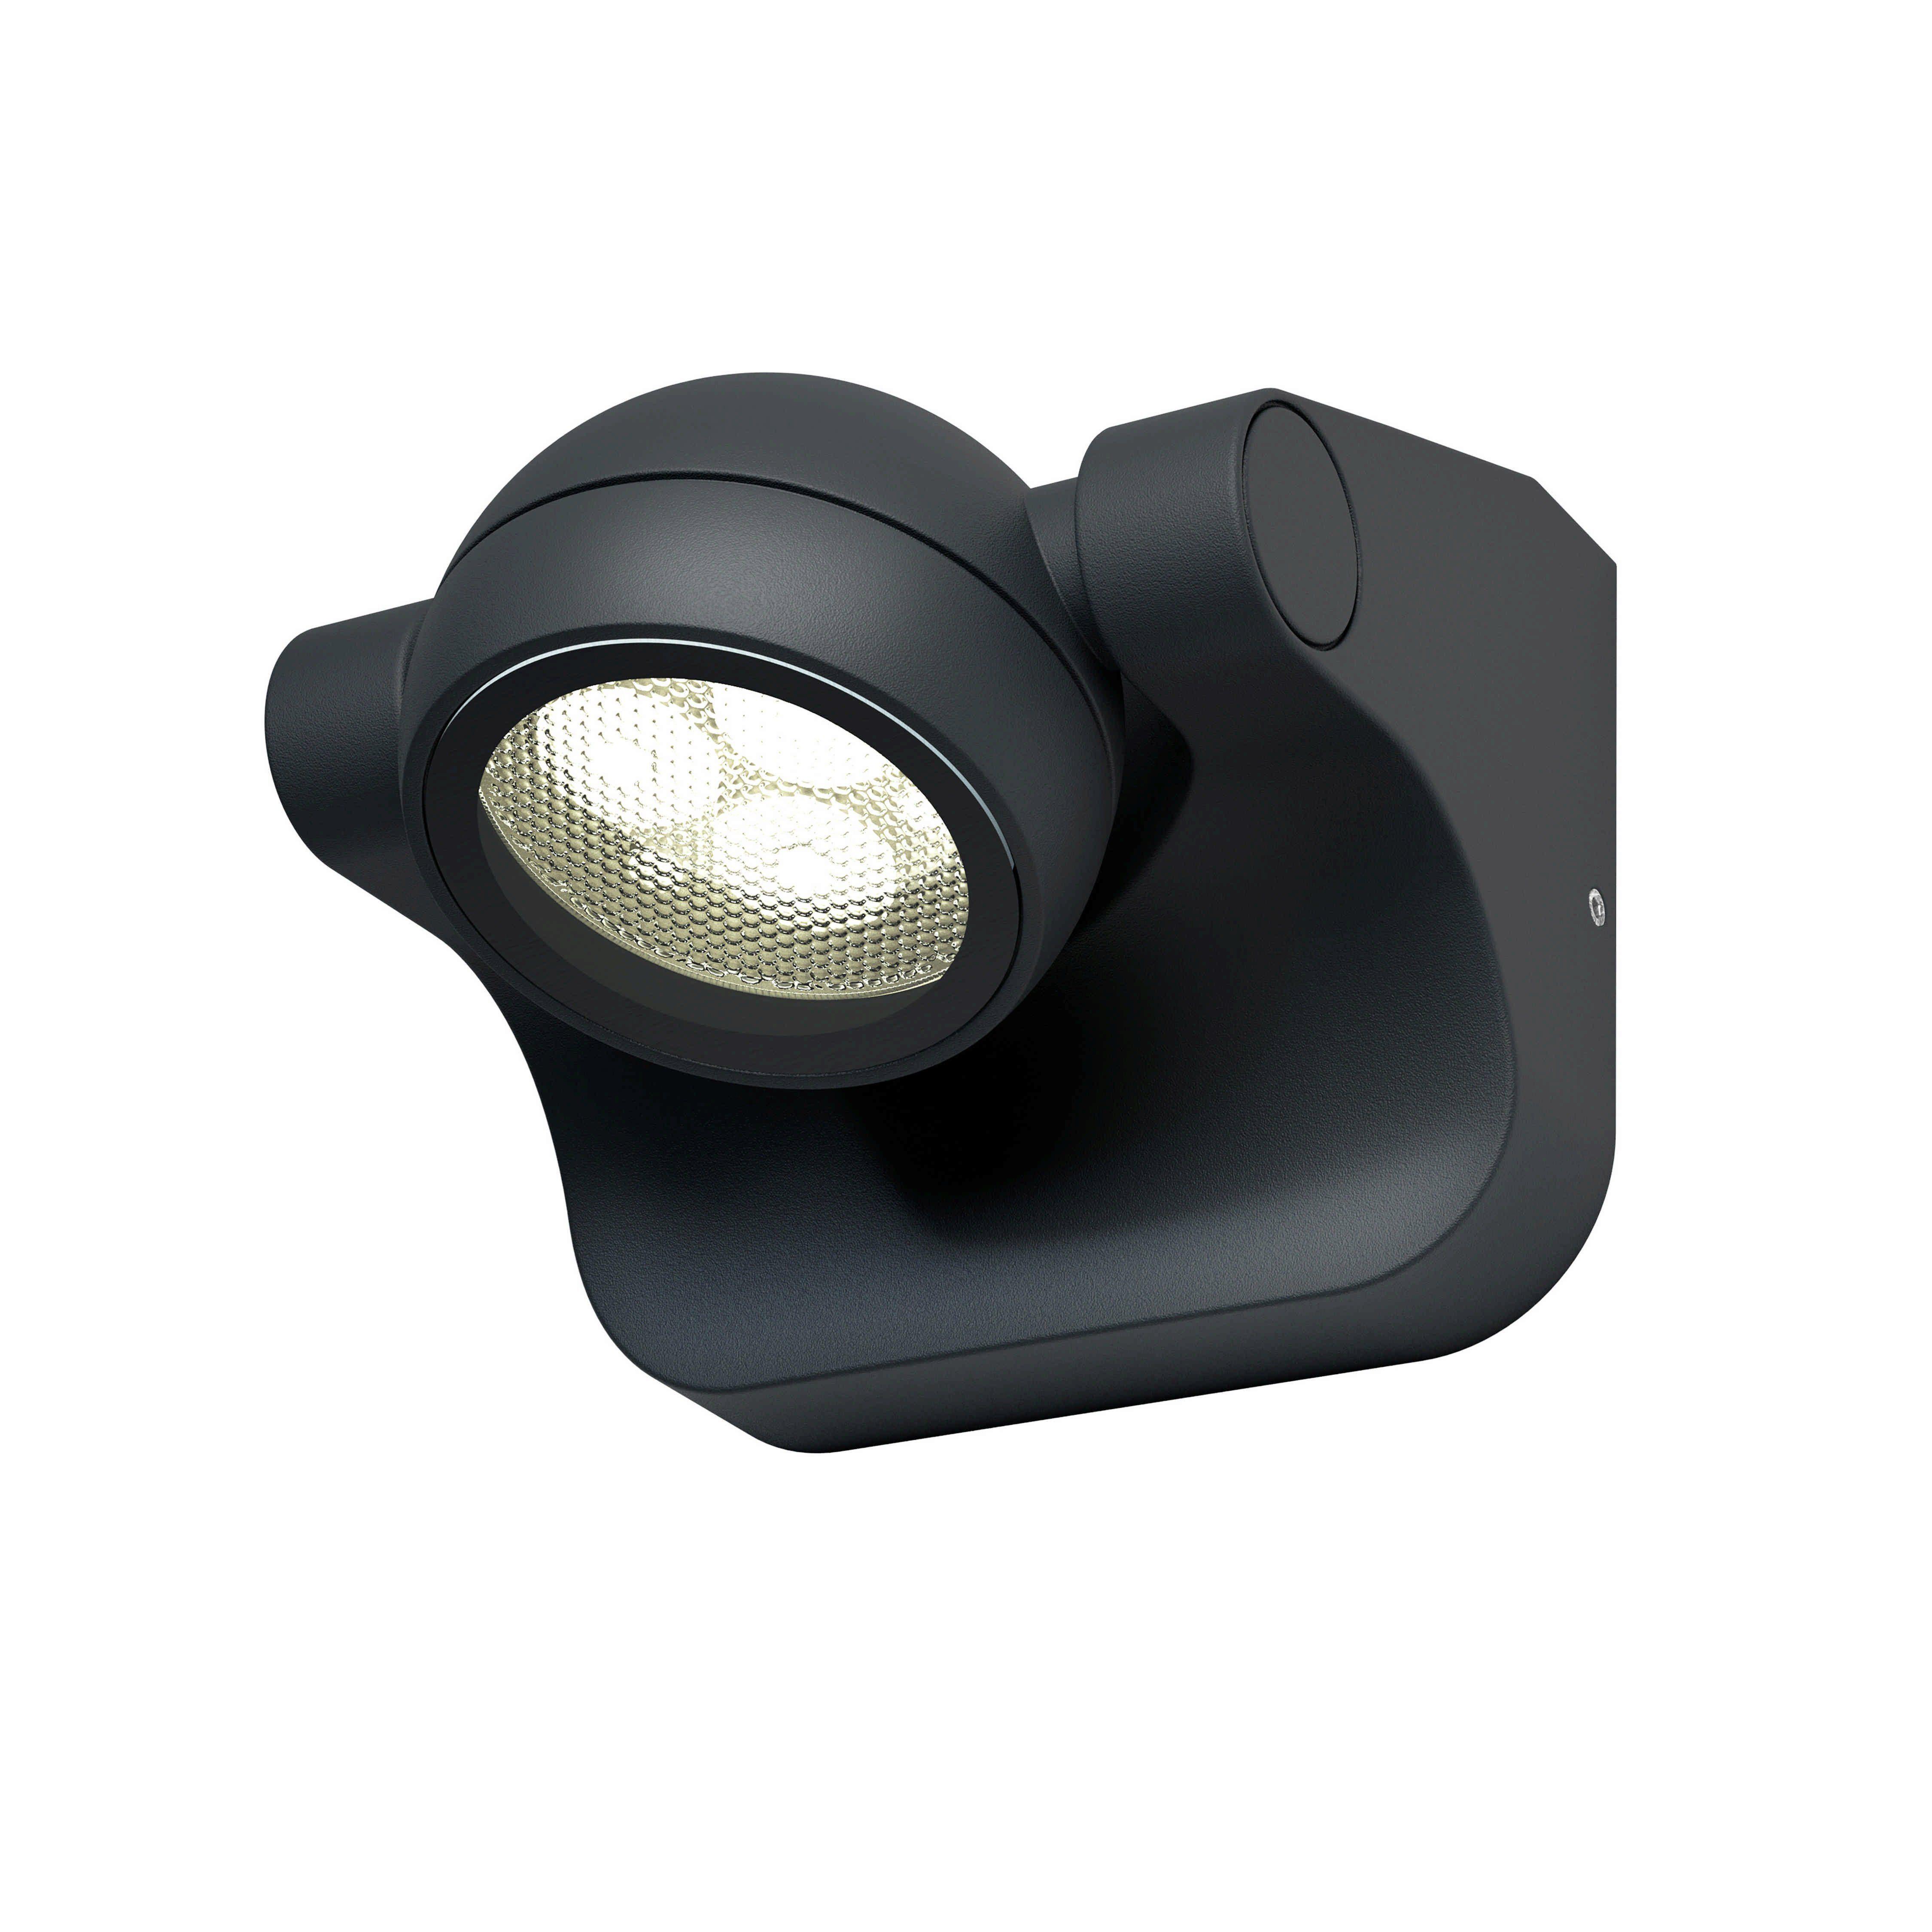 Osram Spotlight LED-Wandlampe mit drehbarem Kopf »ENDURA STYLE Hemisphere 6 W«